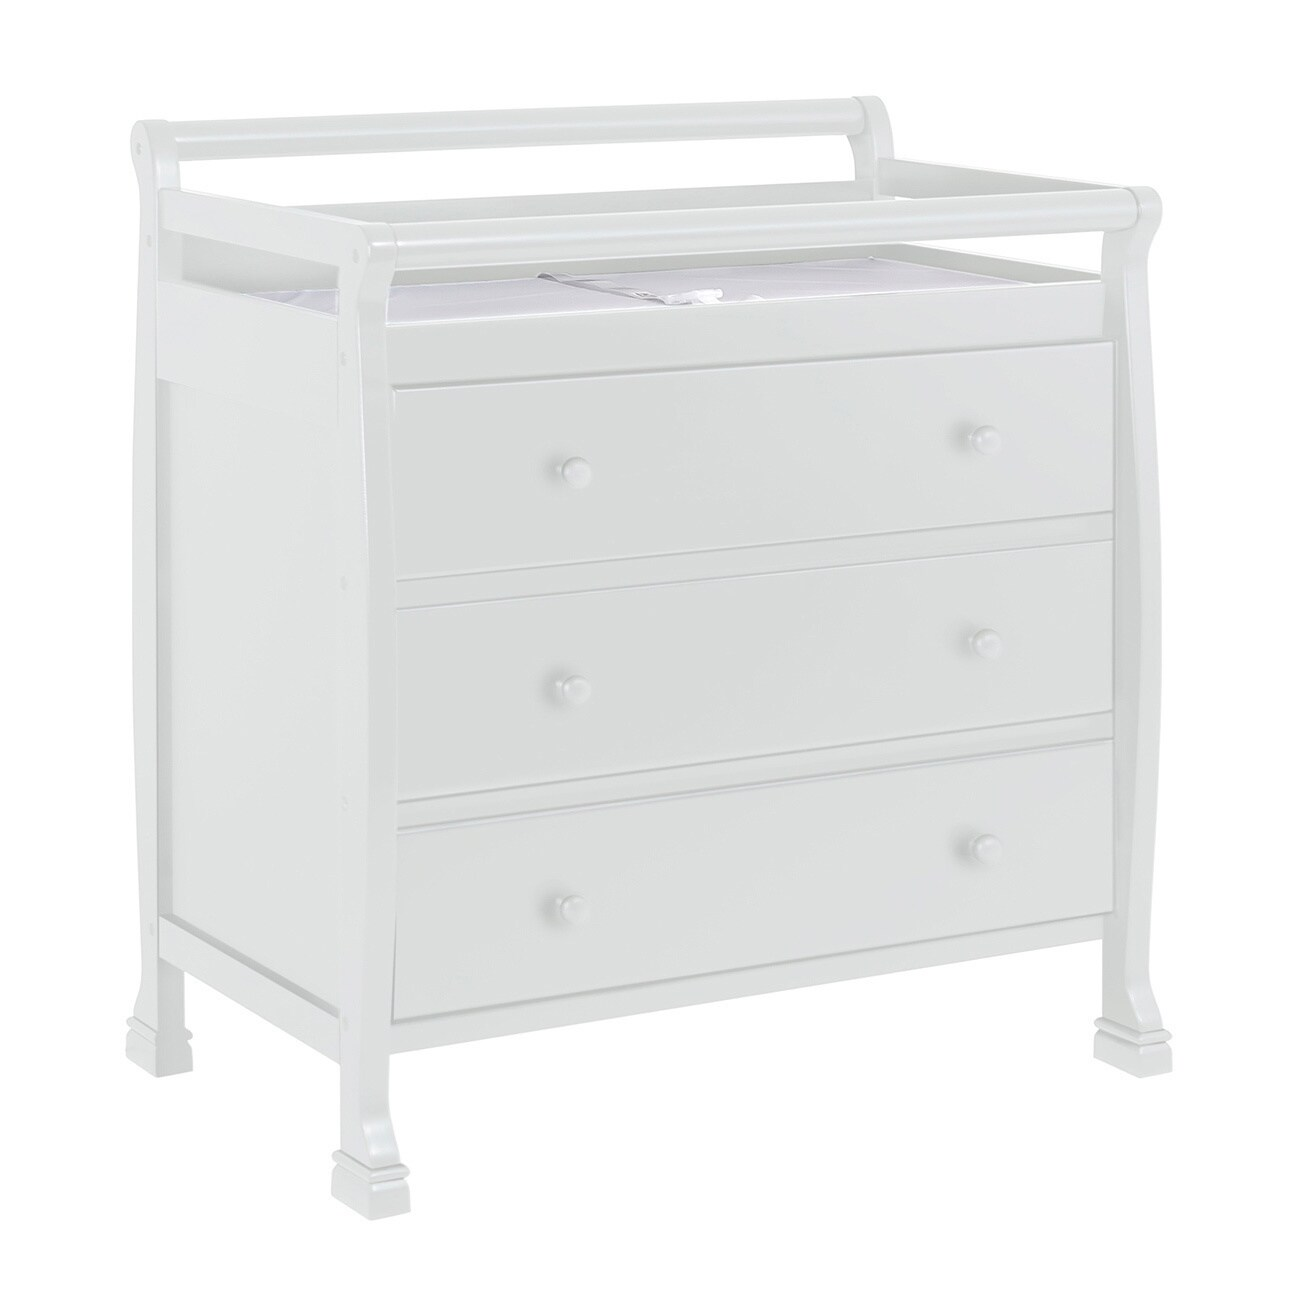 Bon Shop DaVinci Kalani 3 Drawer Changer Dresser   Free Shipping Today    Overstock.com   9008072